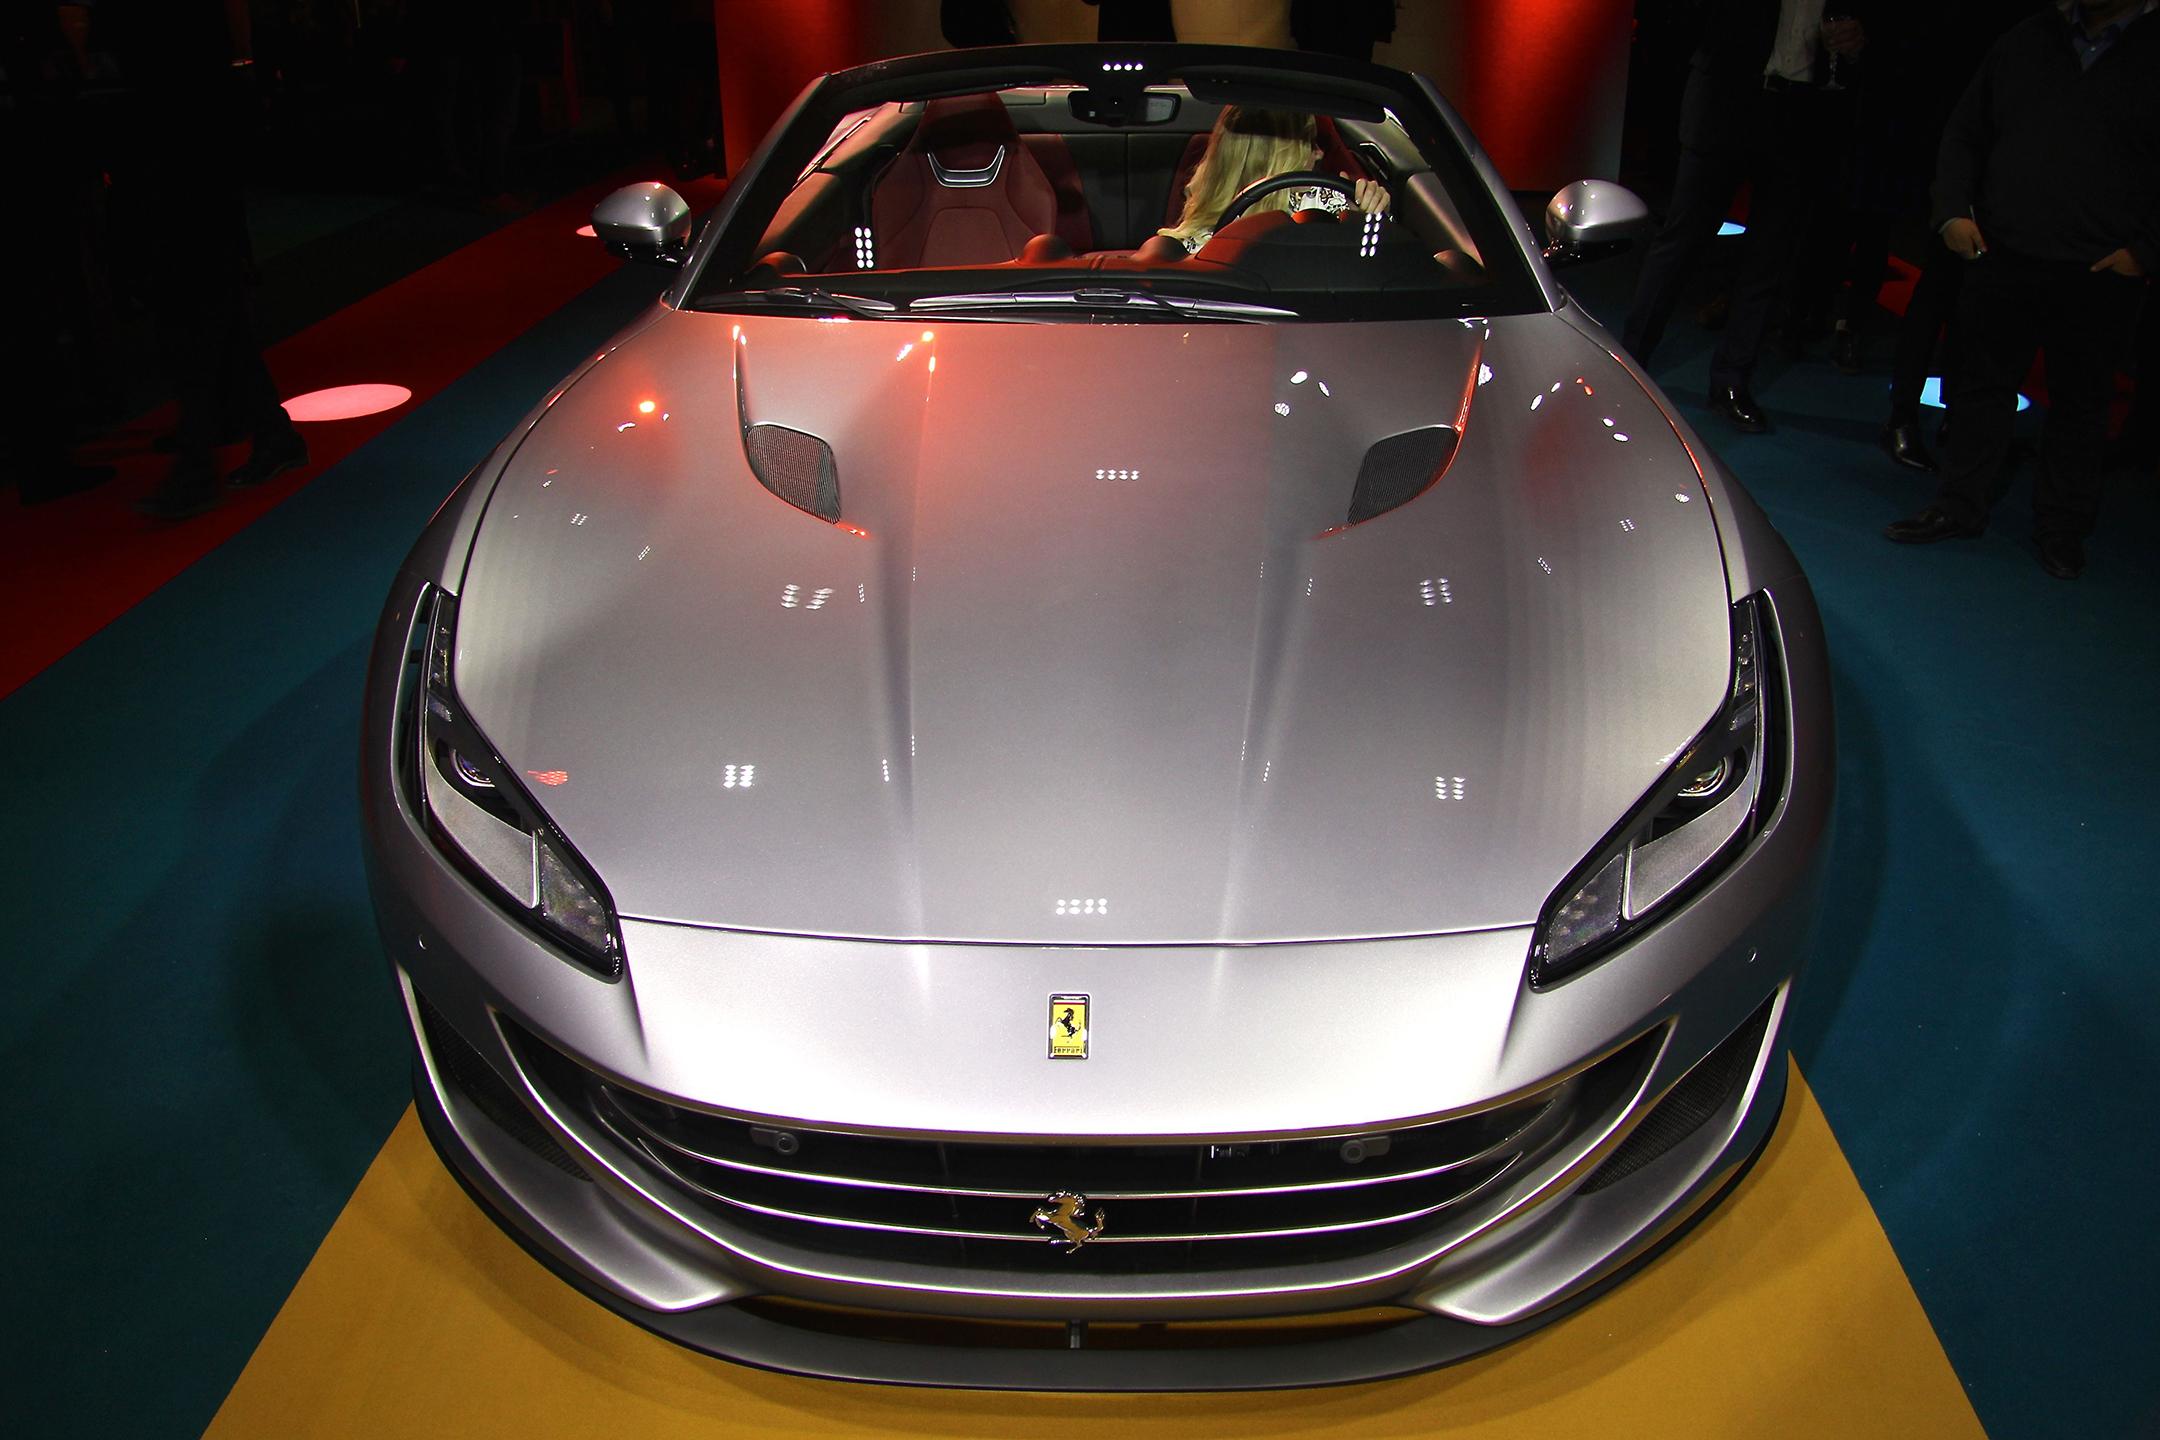 Ferrari Portofino - 2017 - top front / face avant - open top - présentation Ferrari France - photo Ludo Ferrari